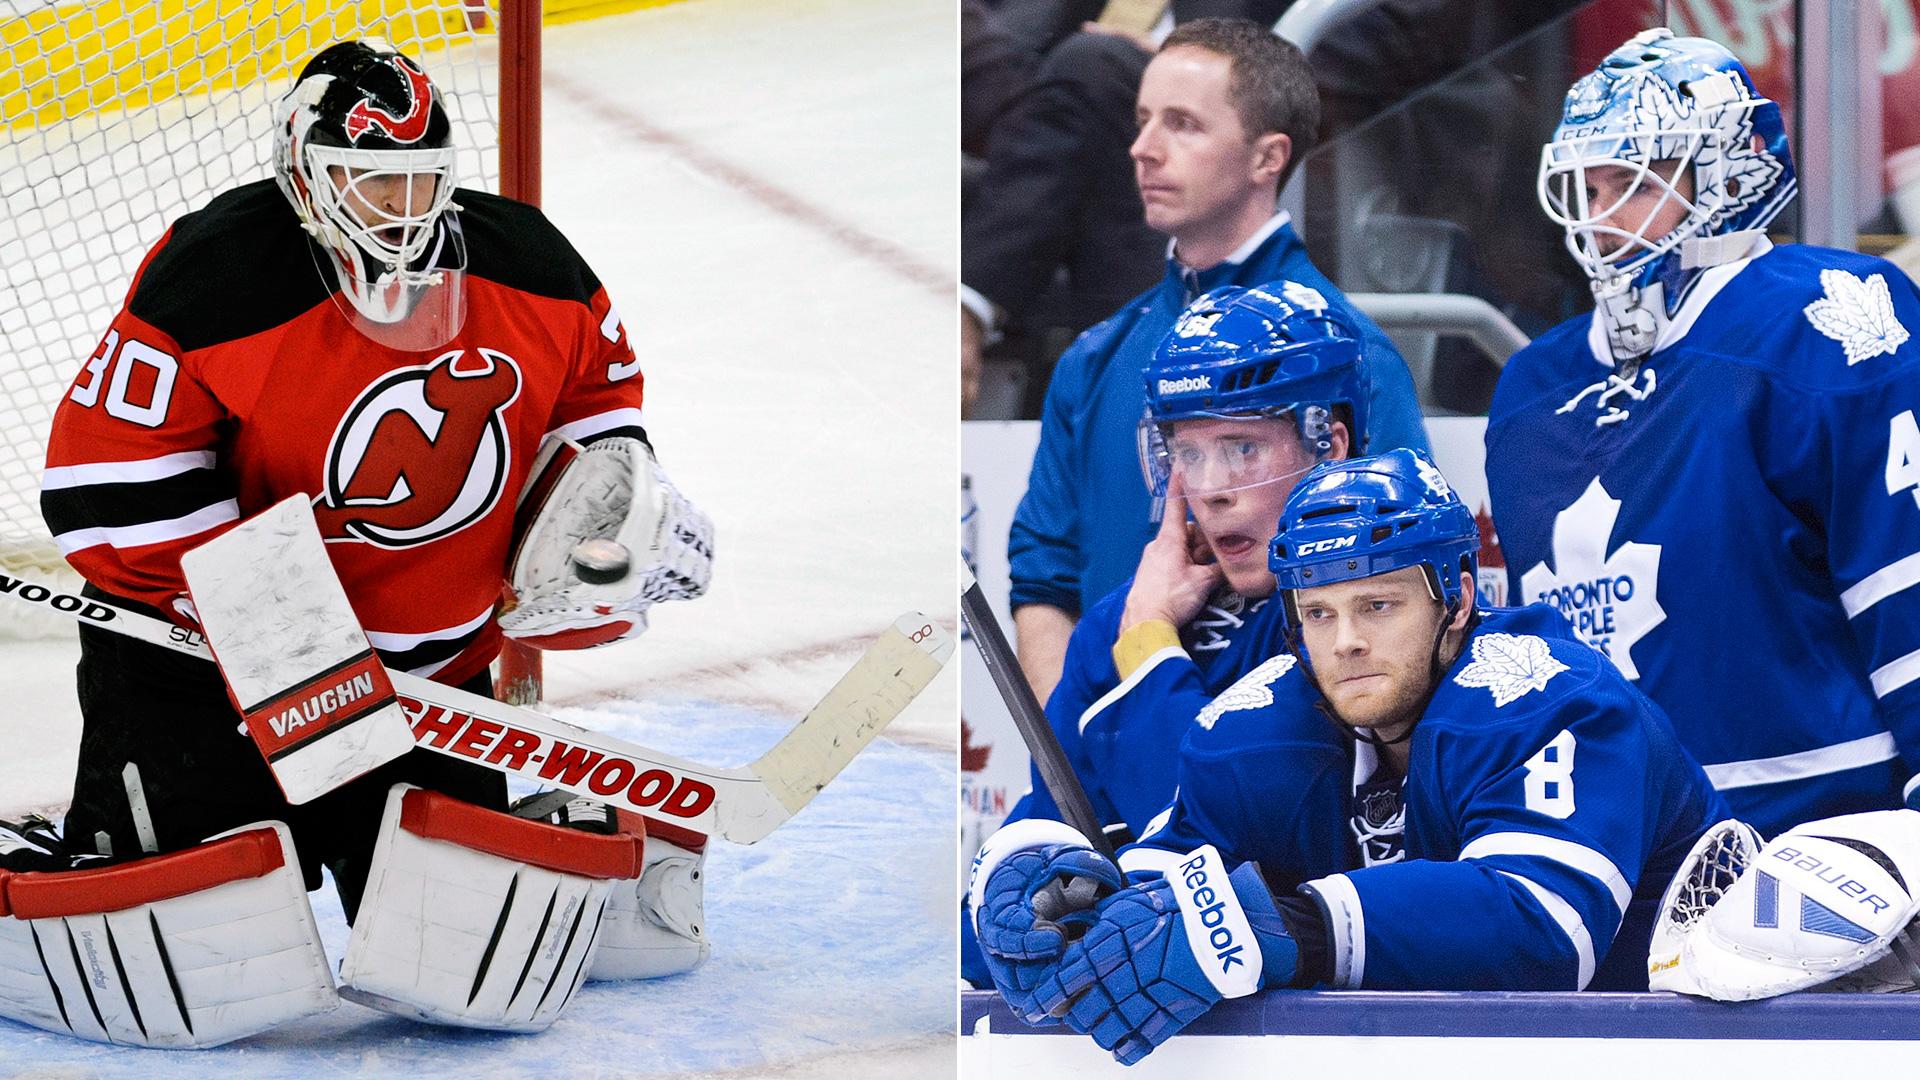 Maple-Leafs-Dejection-and-Martin-Brodeur-032714-AP-FTR.jpg